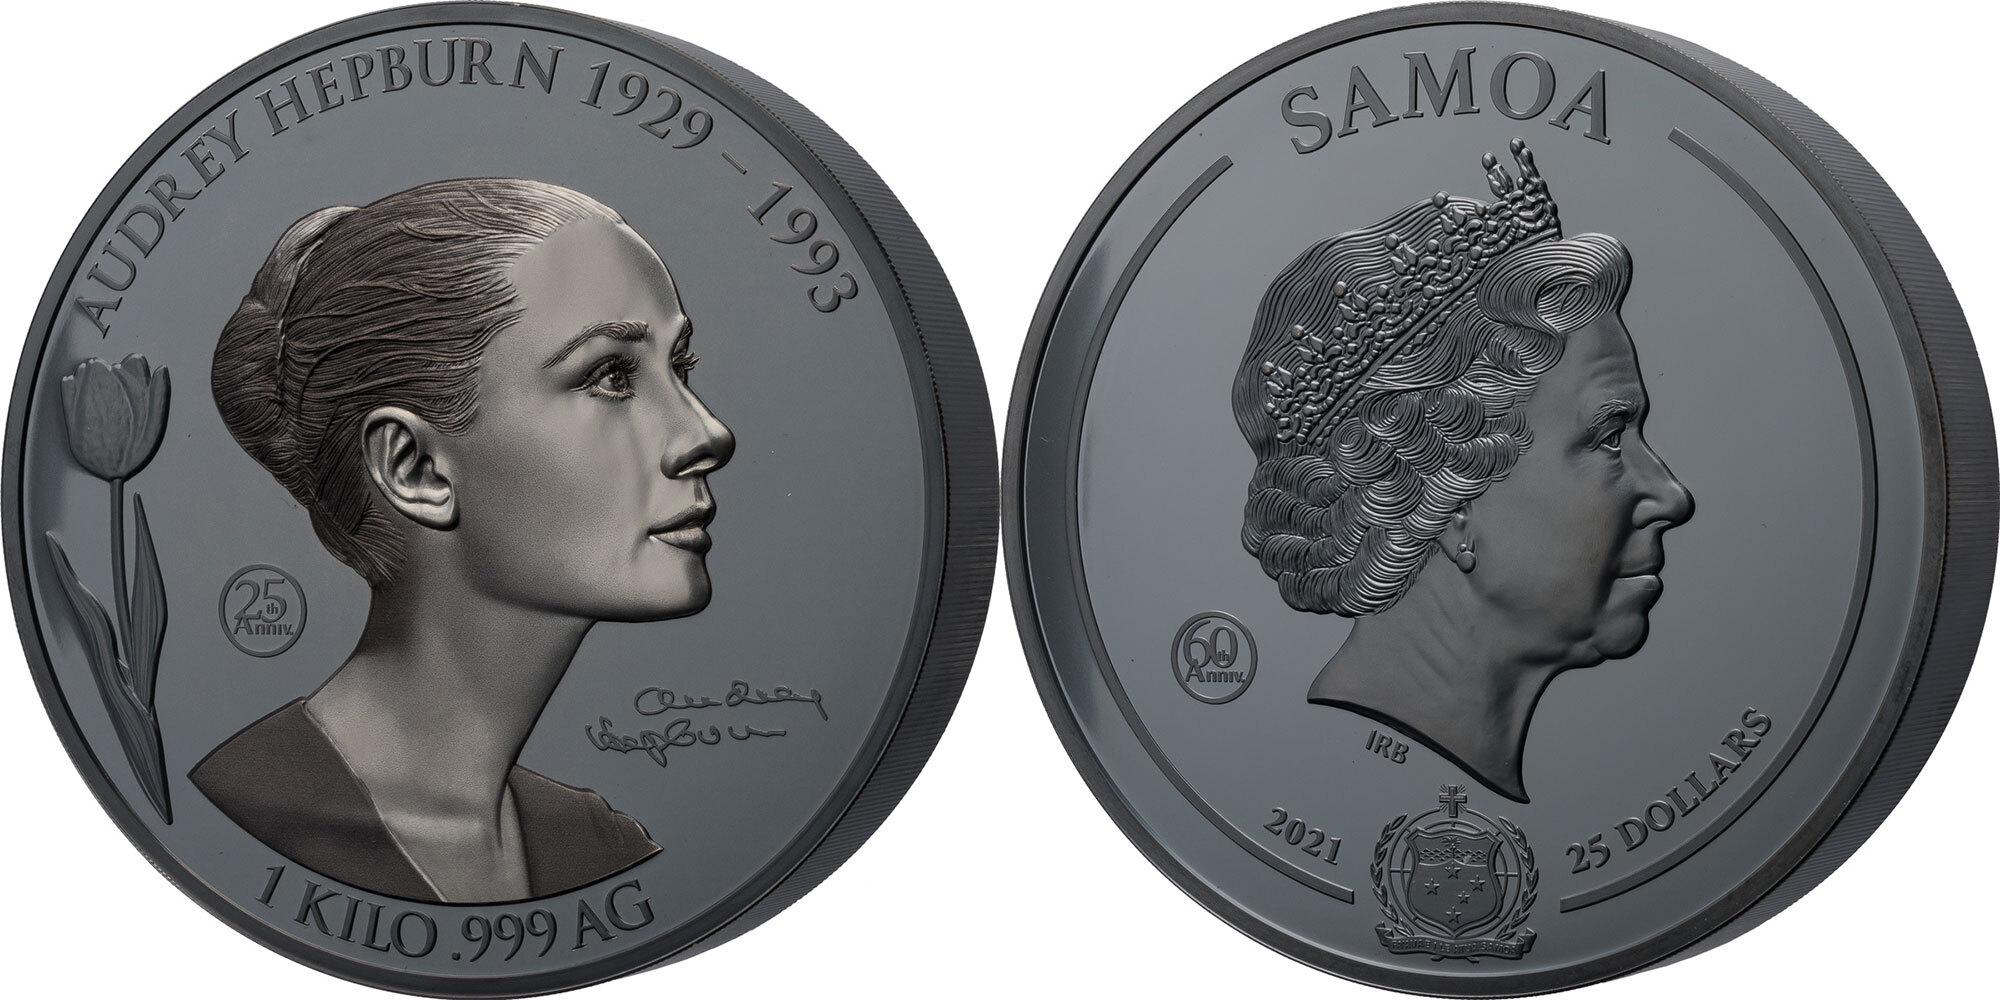 samoa-2021-audrey-hepburn-kg